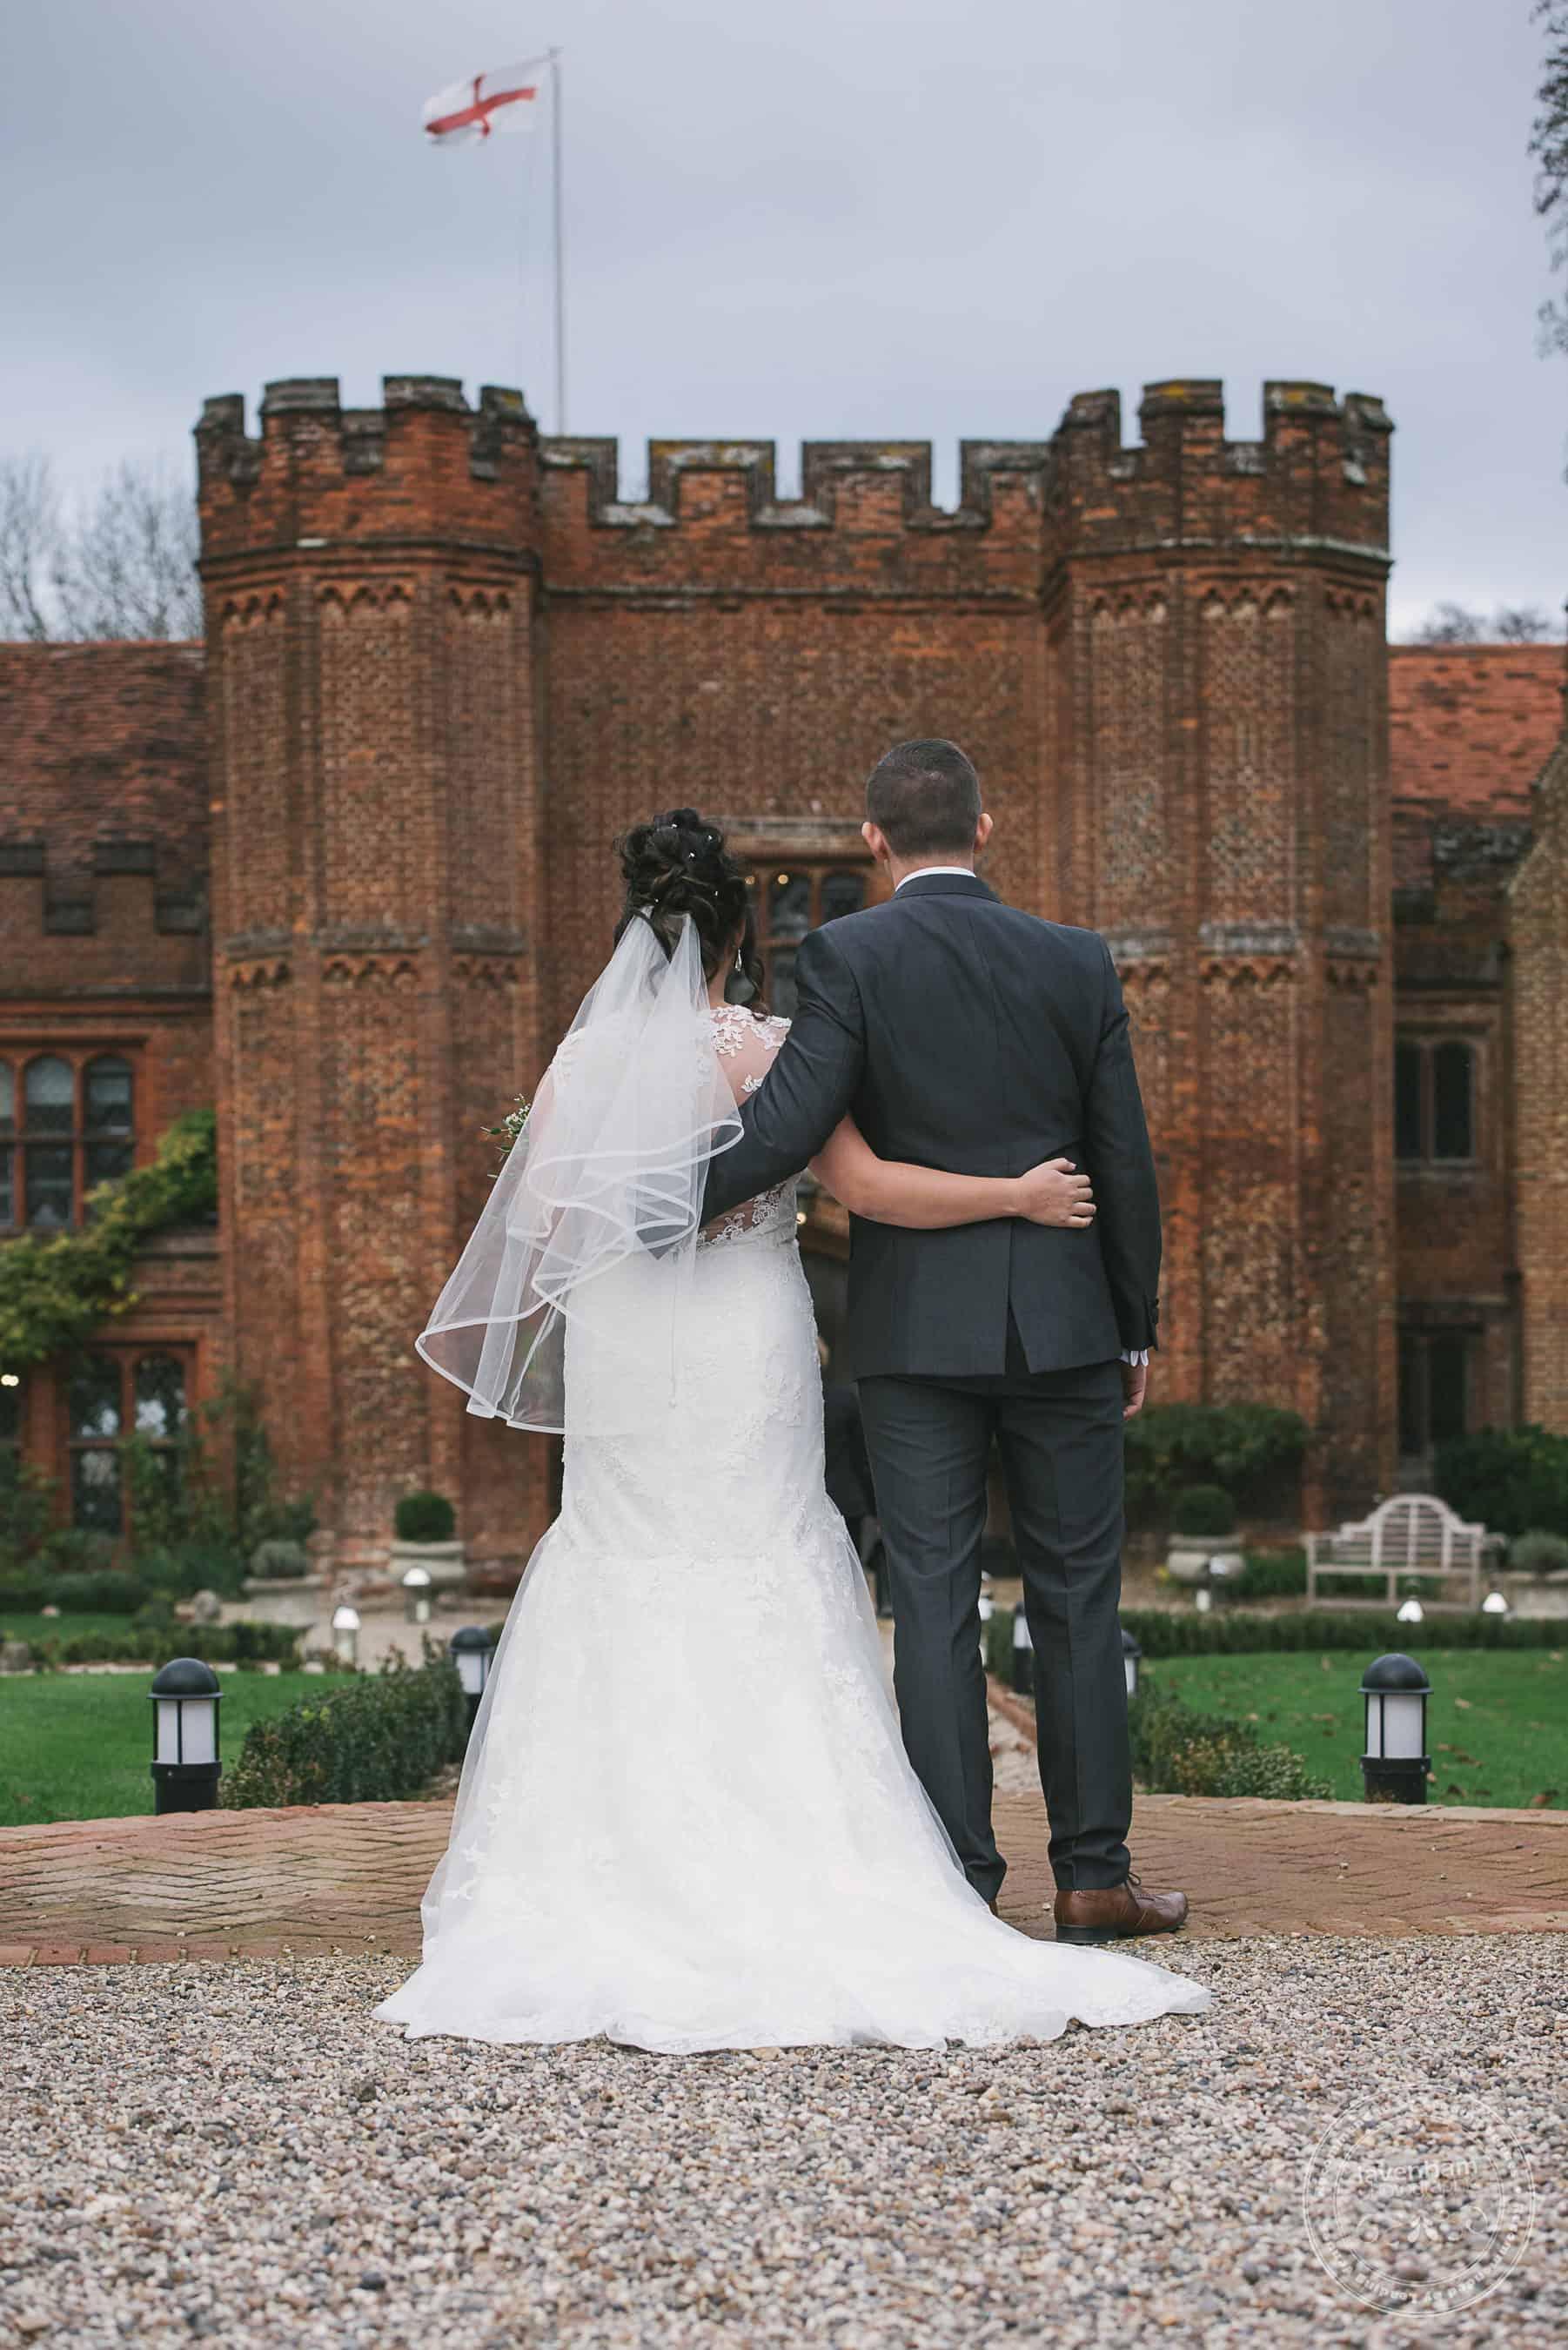 251118 Leez Priory Wedding Photography by Lavenham Photographic 051